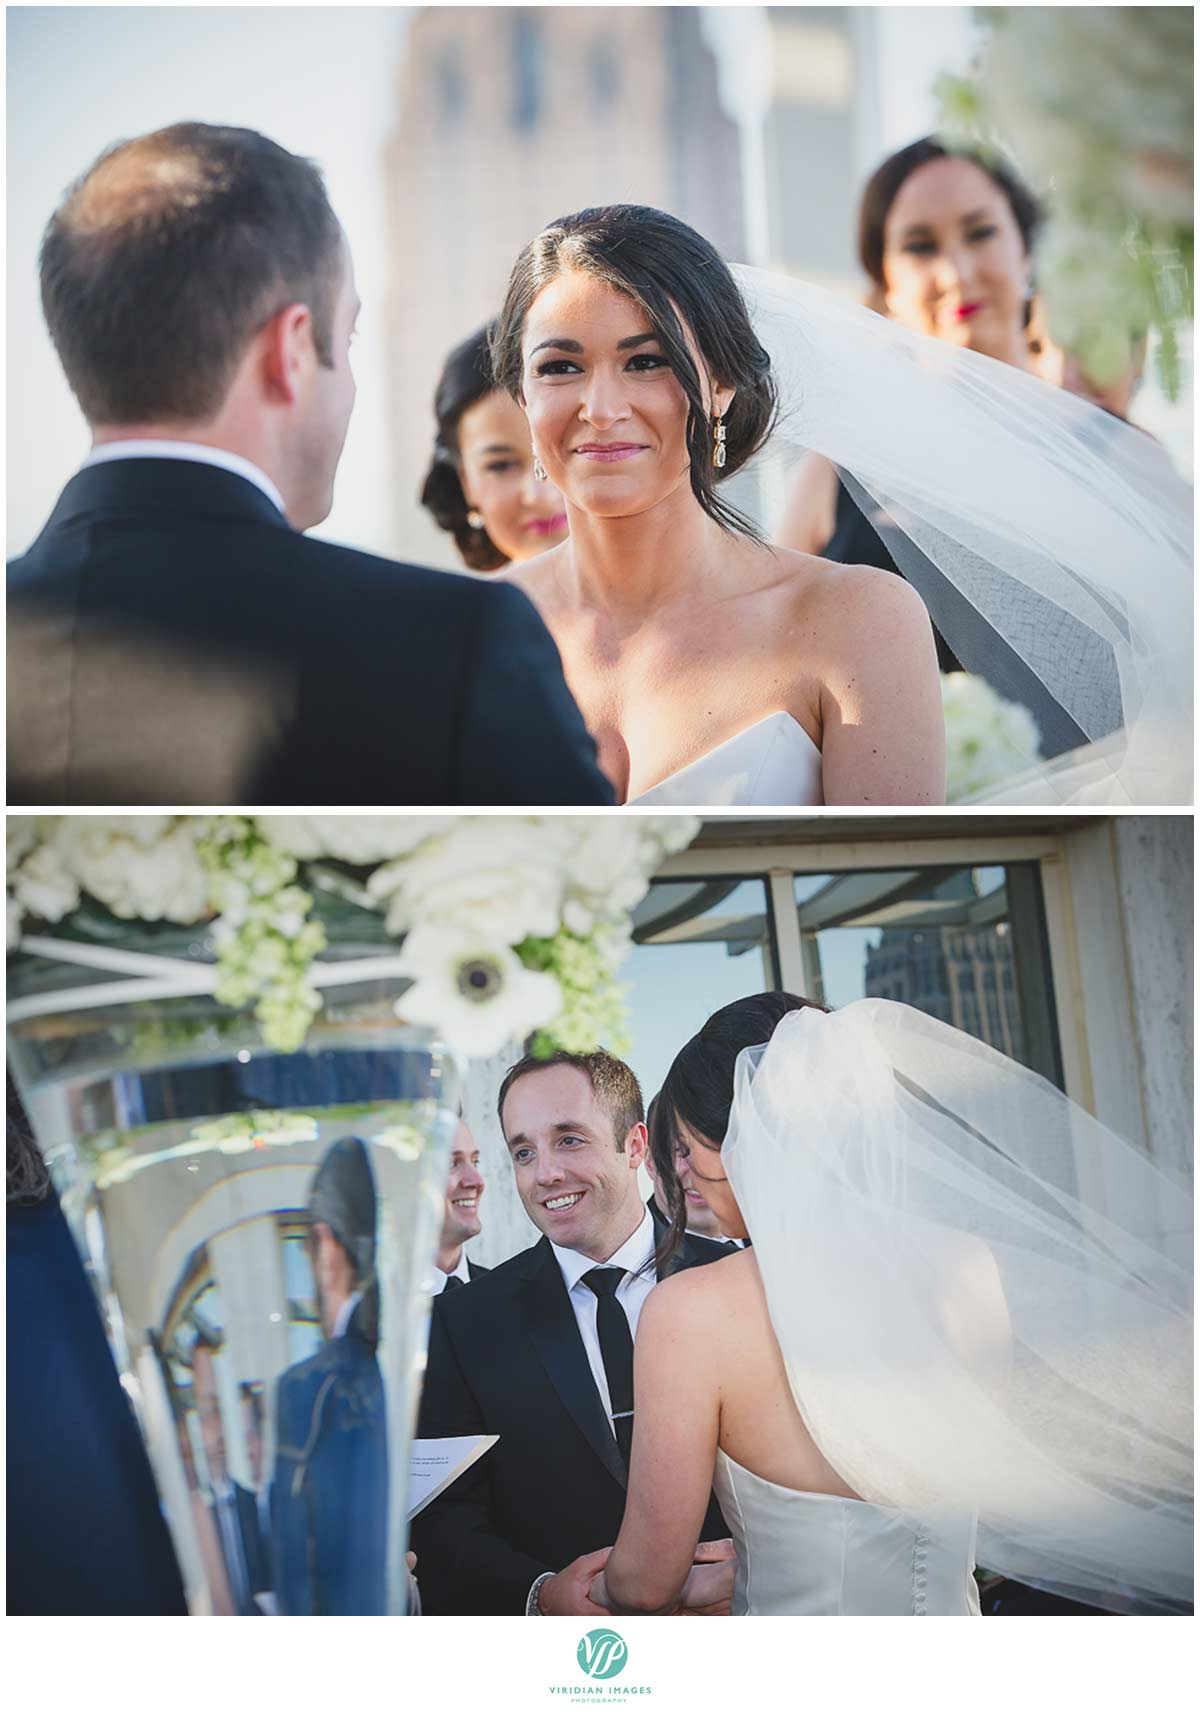 Peachtree_Club_Atlanta_Wedding_Viridian_Images_Photography-23